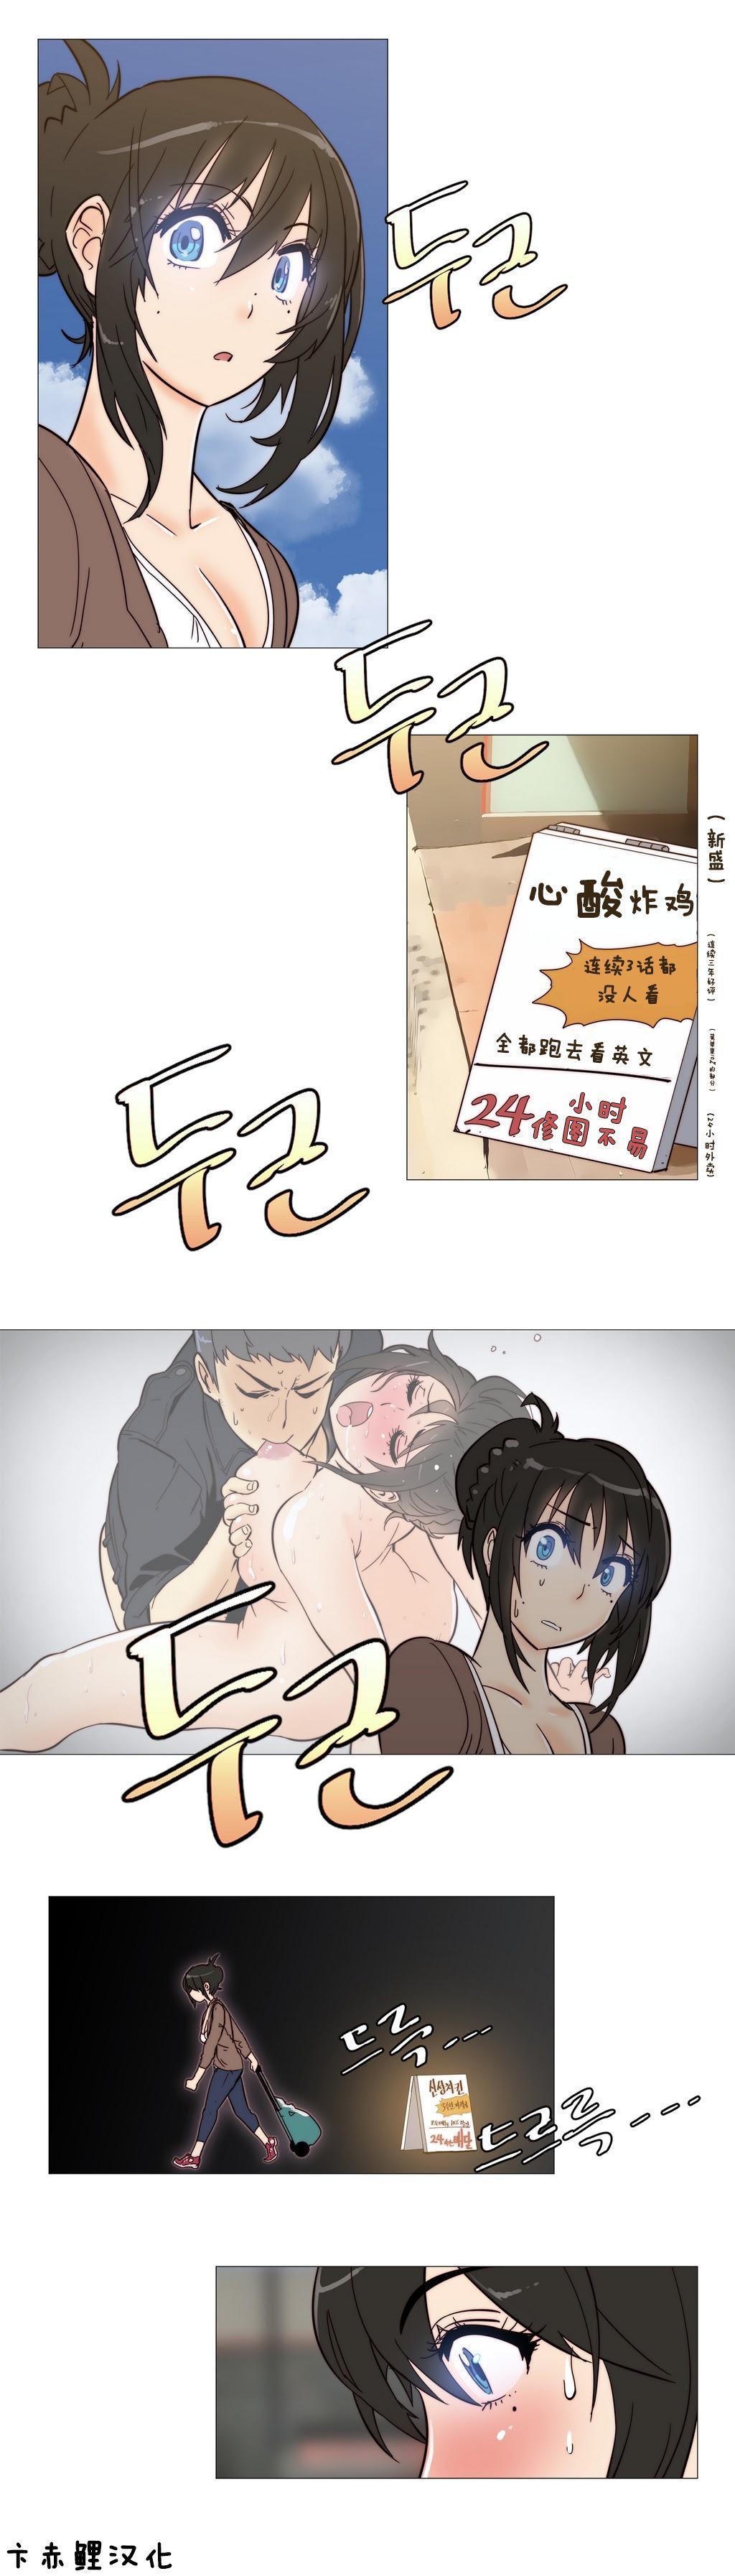 HouseHold Affairs 【卞赤鲤个人汉化】1~33话(持续更新中) 62